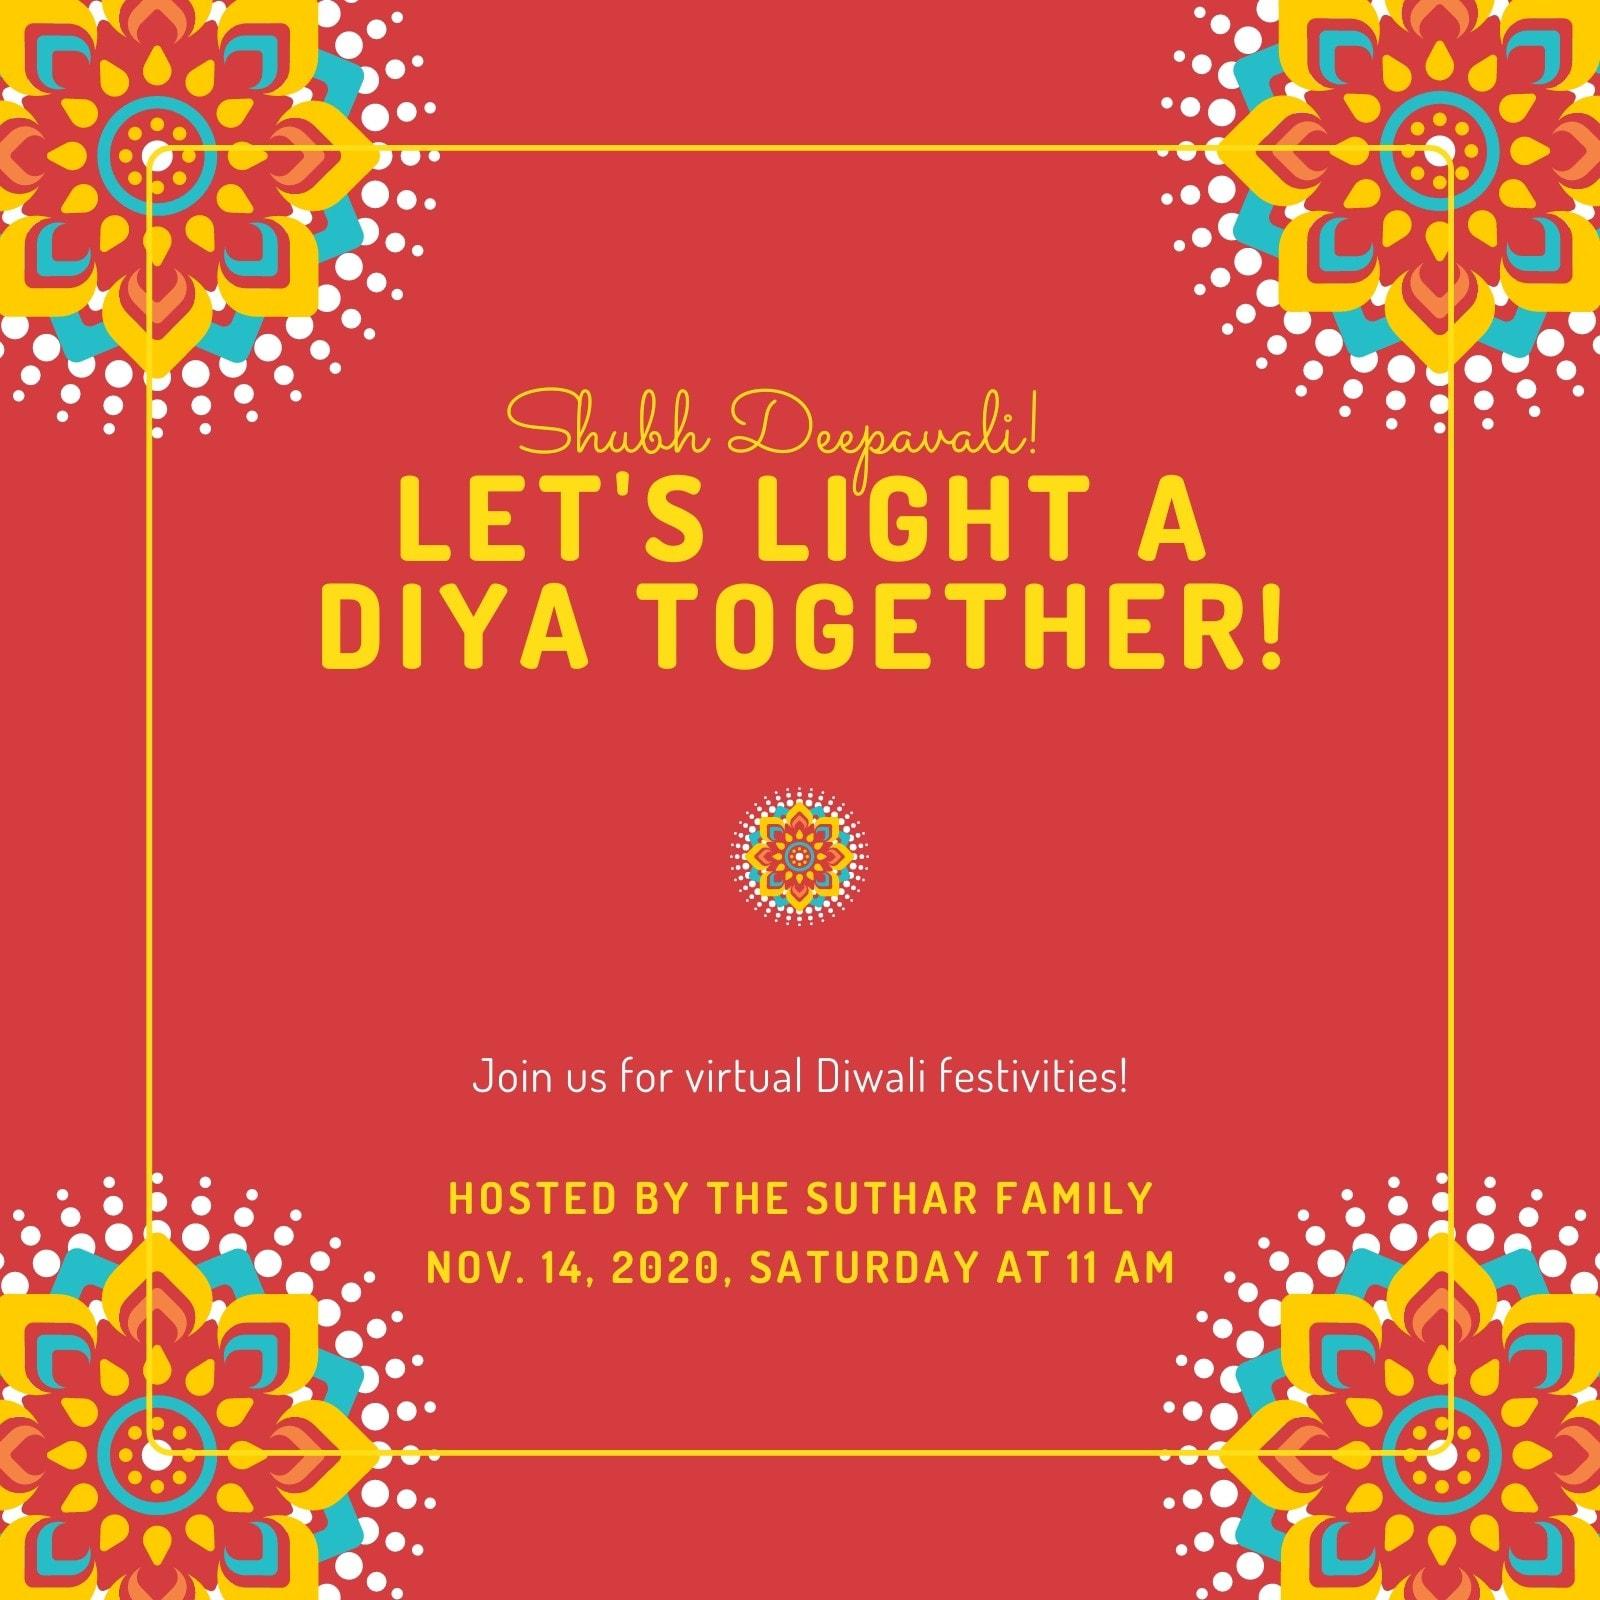 Red and Yellow Diwali Night Invite